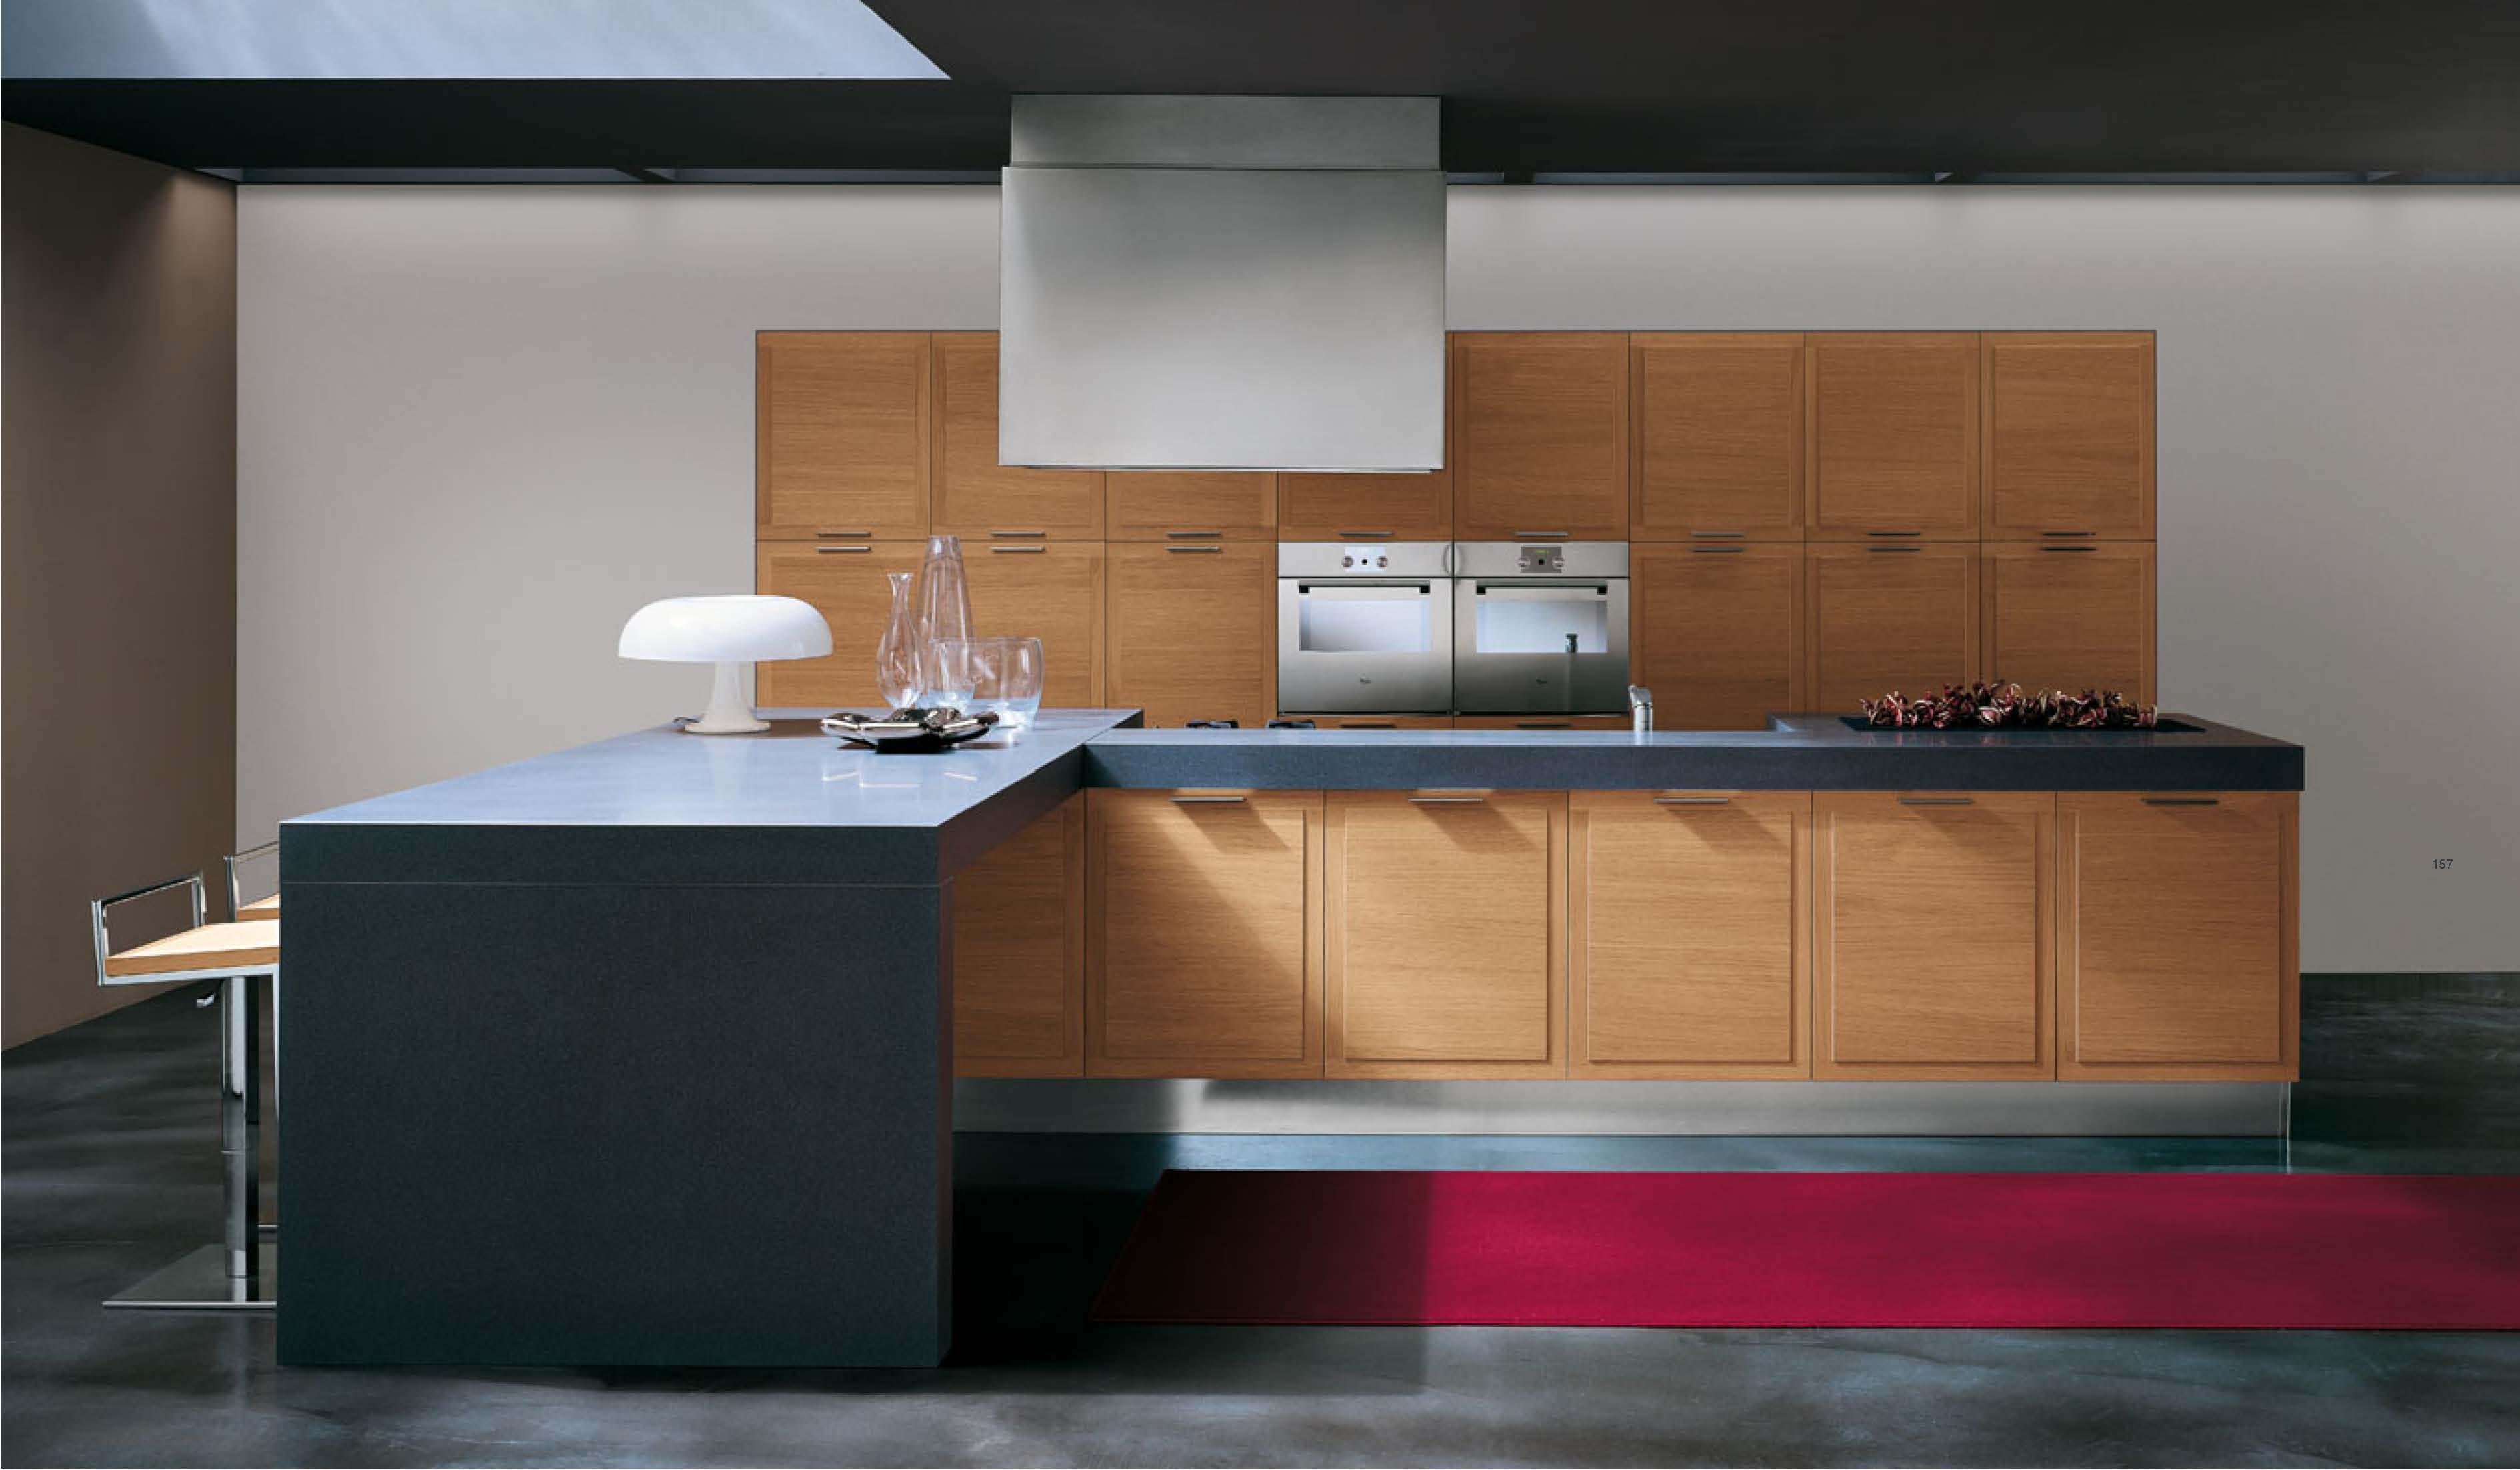 Cucina in Rovere - Arredamento moderno